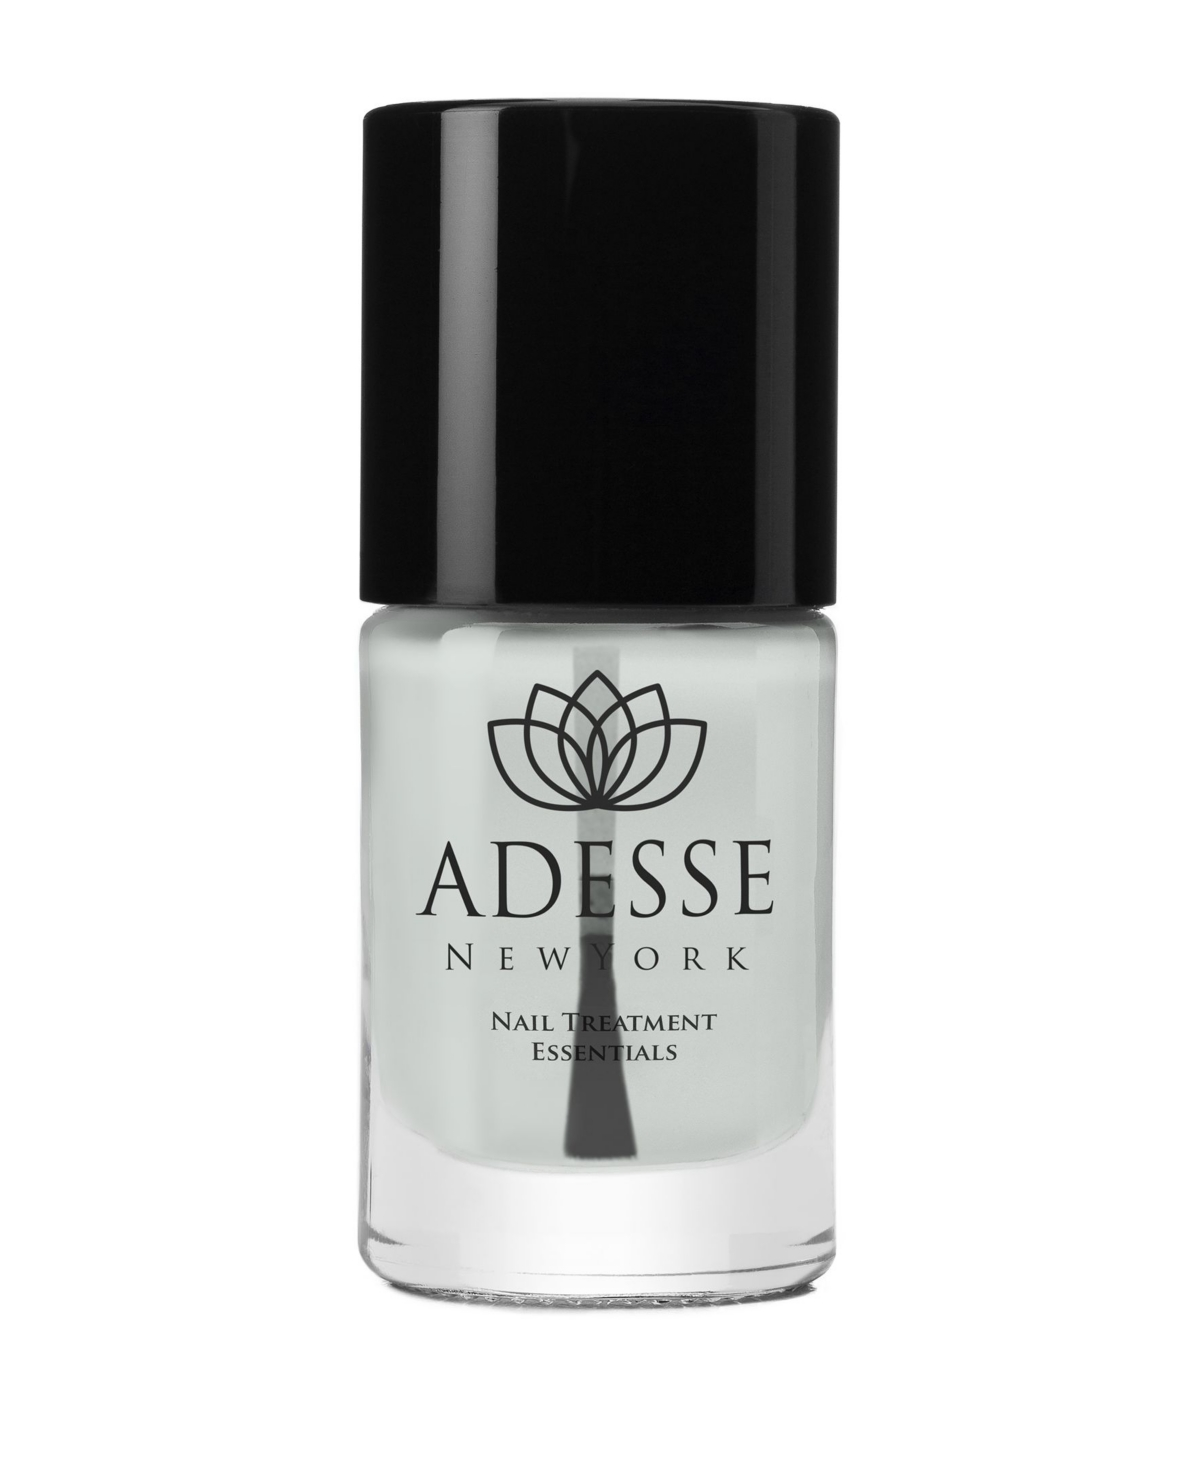 Adesse New York Nail Defense Serum